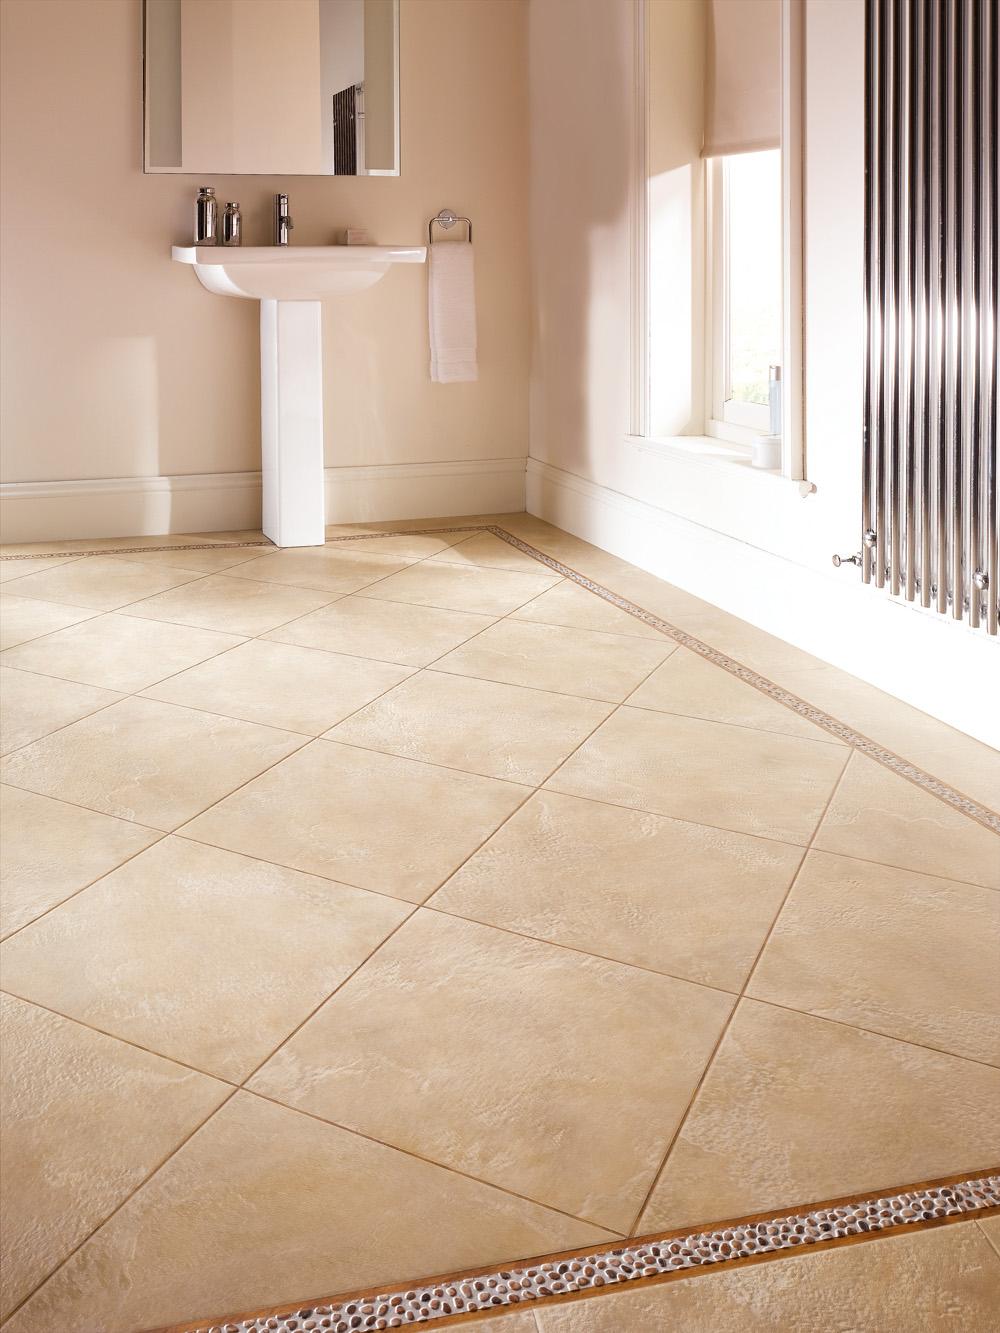 Vinyl tile 45 ft bathroom arabian princes 45 for 100 floors floor 89